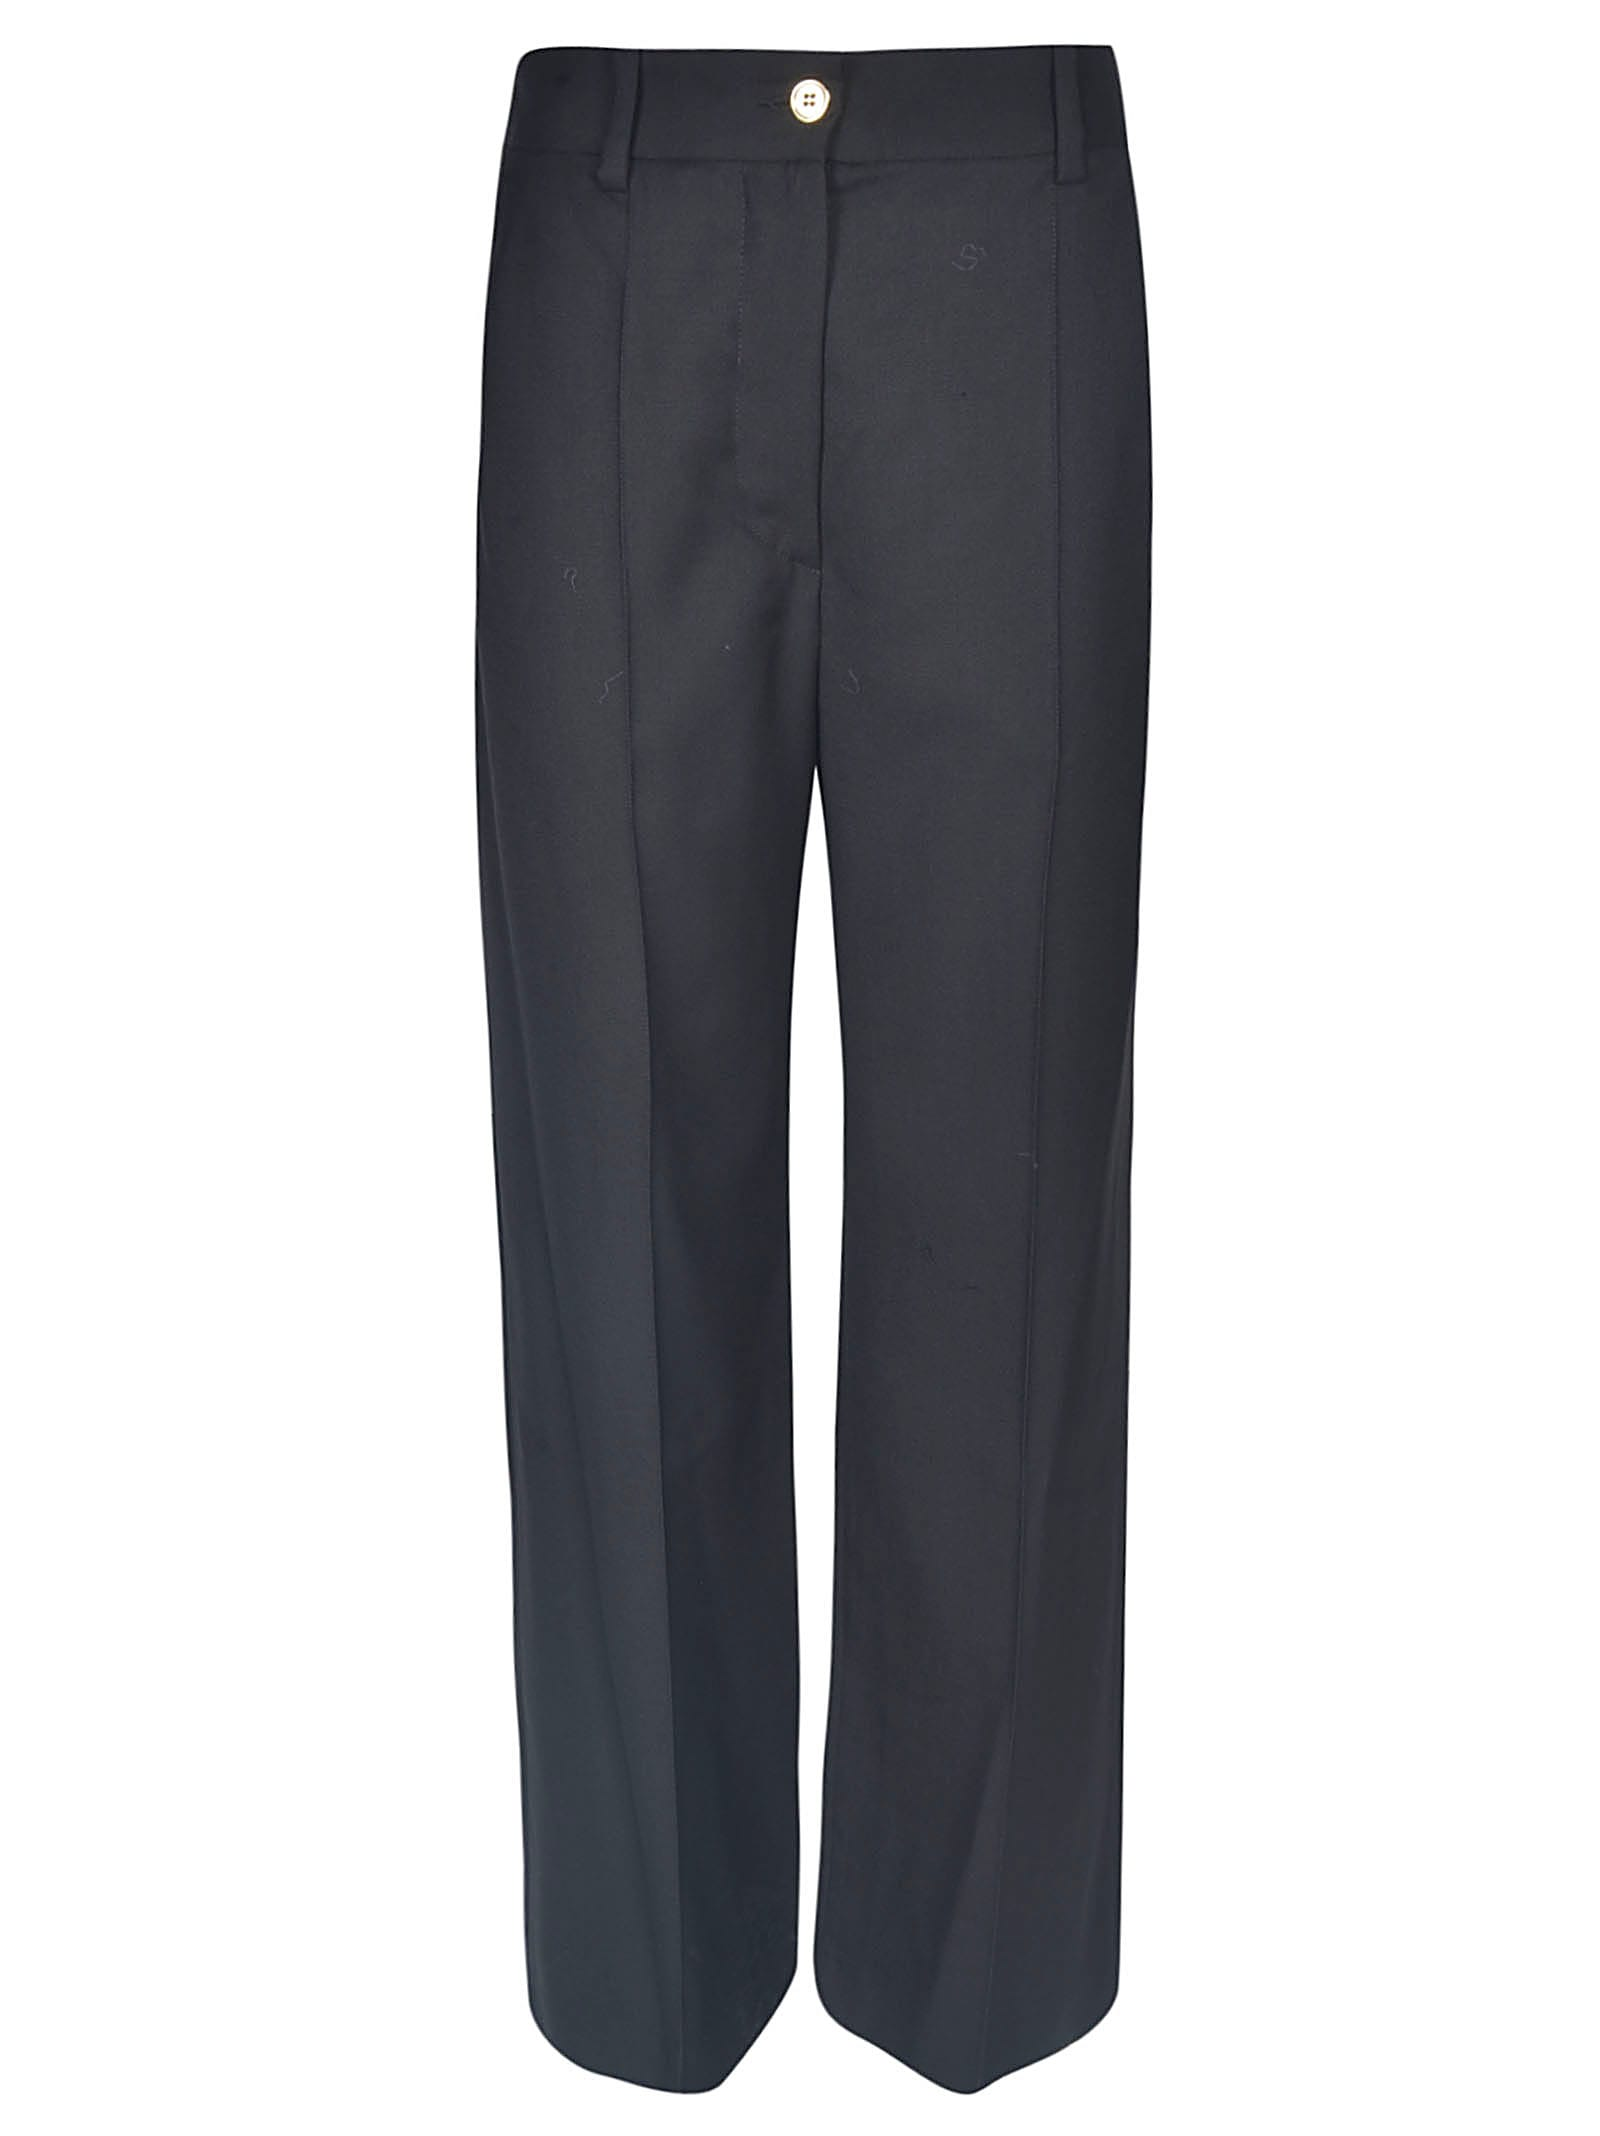 Patou Iconic Long Trousers